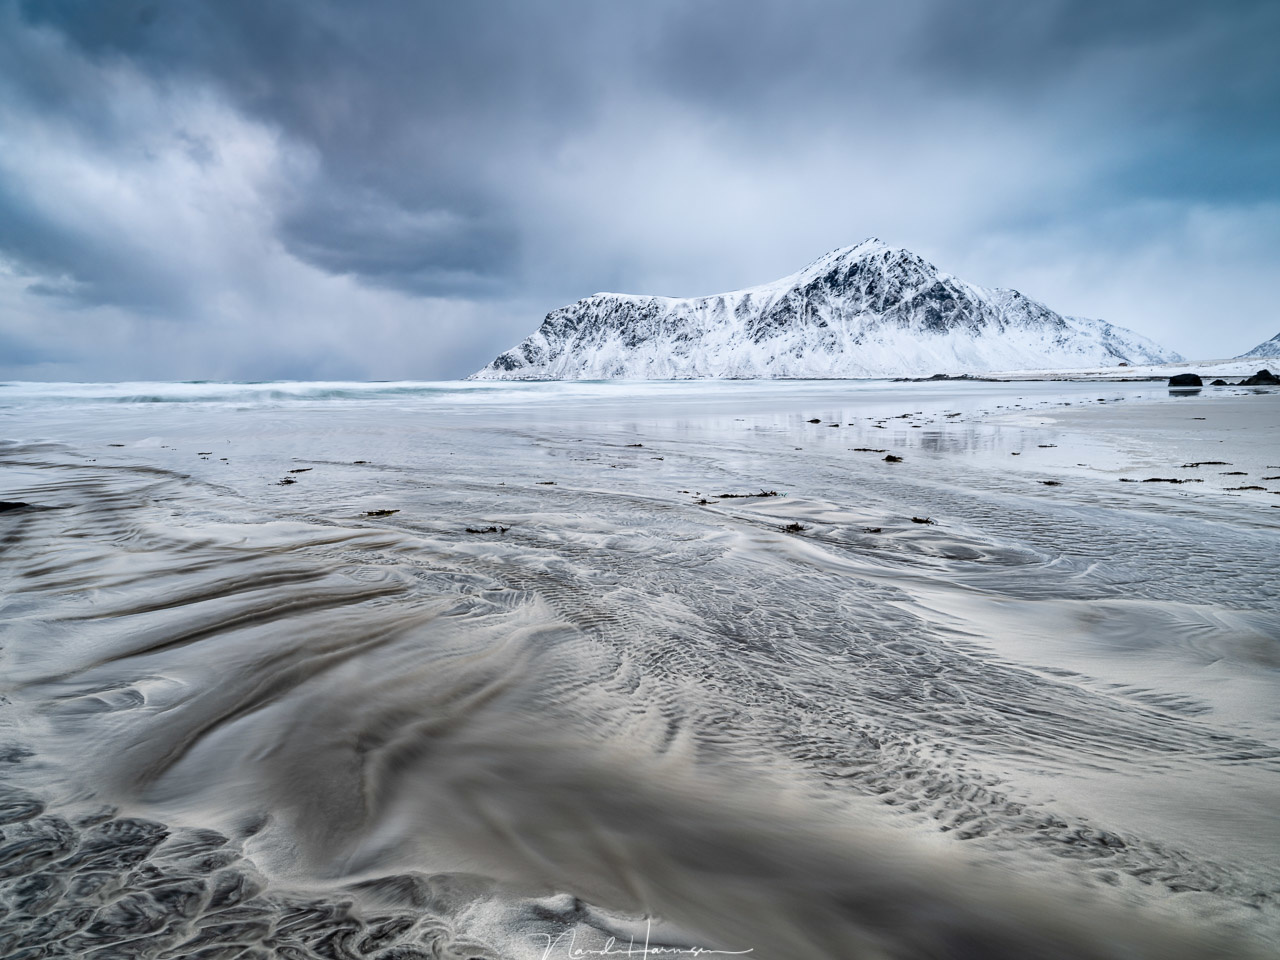 Skagsanden Beach (23mm, ISO100, f/10, 3,2s, Haida medium 0,9GND + CPL, from tripod)